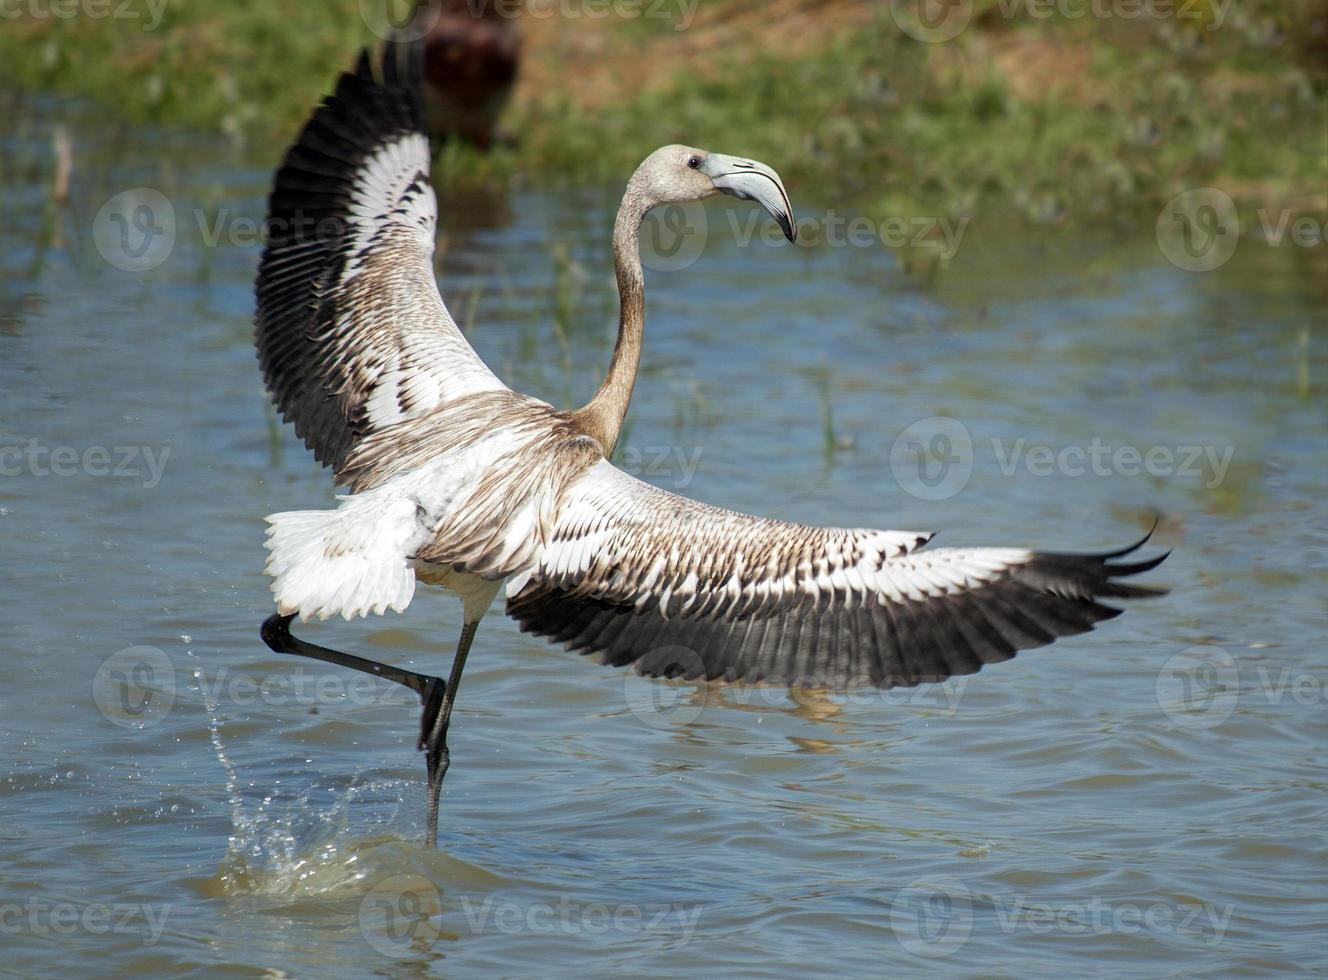 phoenicopterus ruber, flamingo jovem, em ambiente natural foto